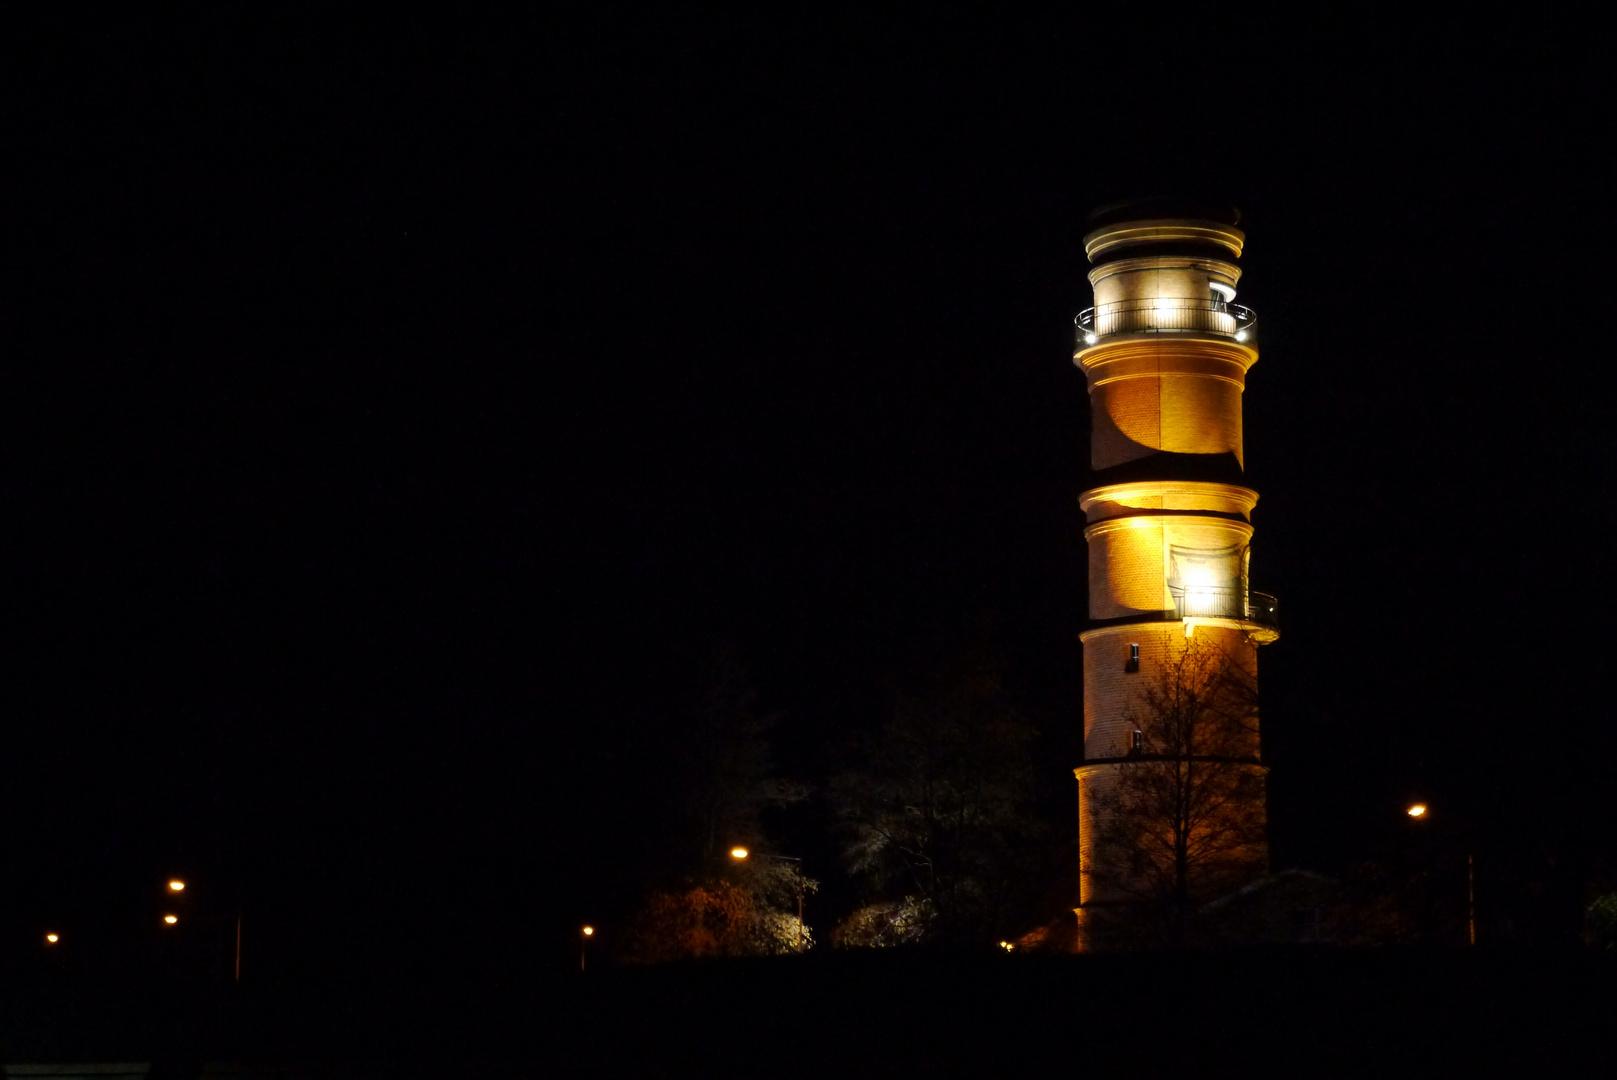 Turm in Travemünde